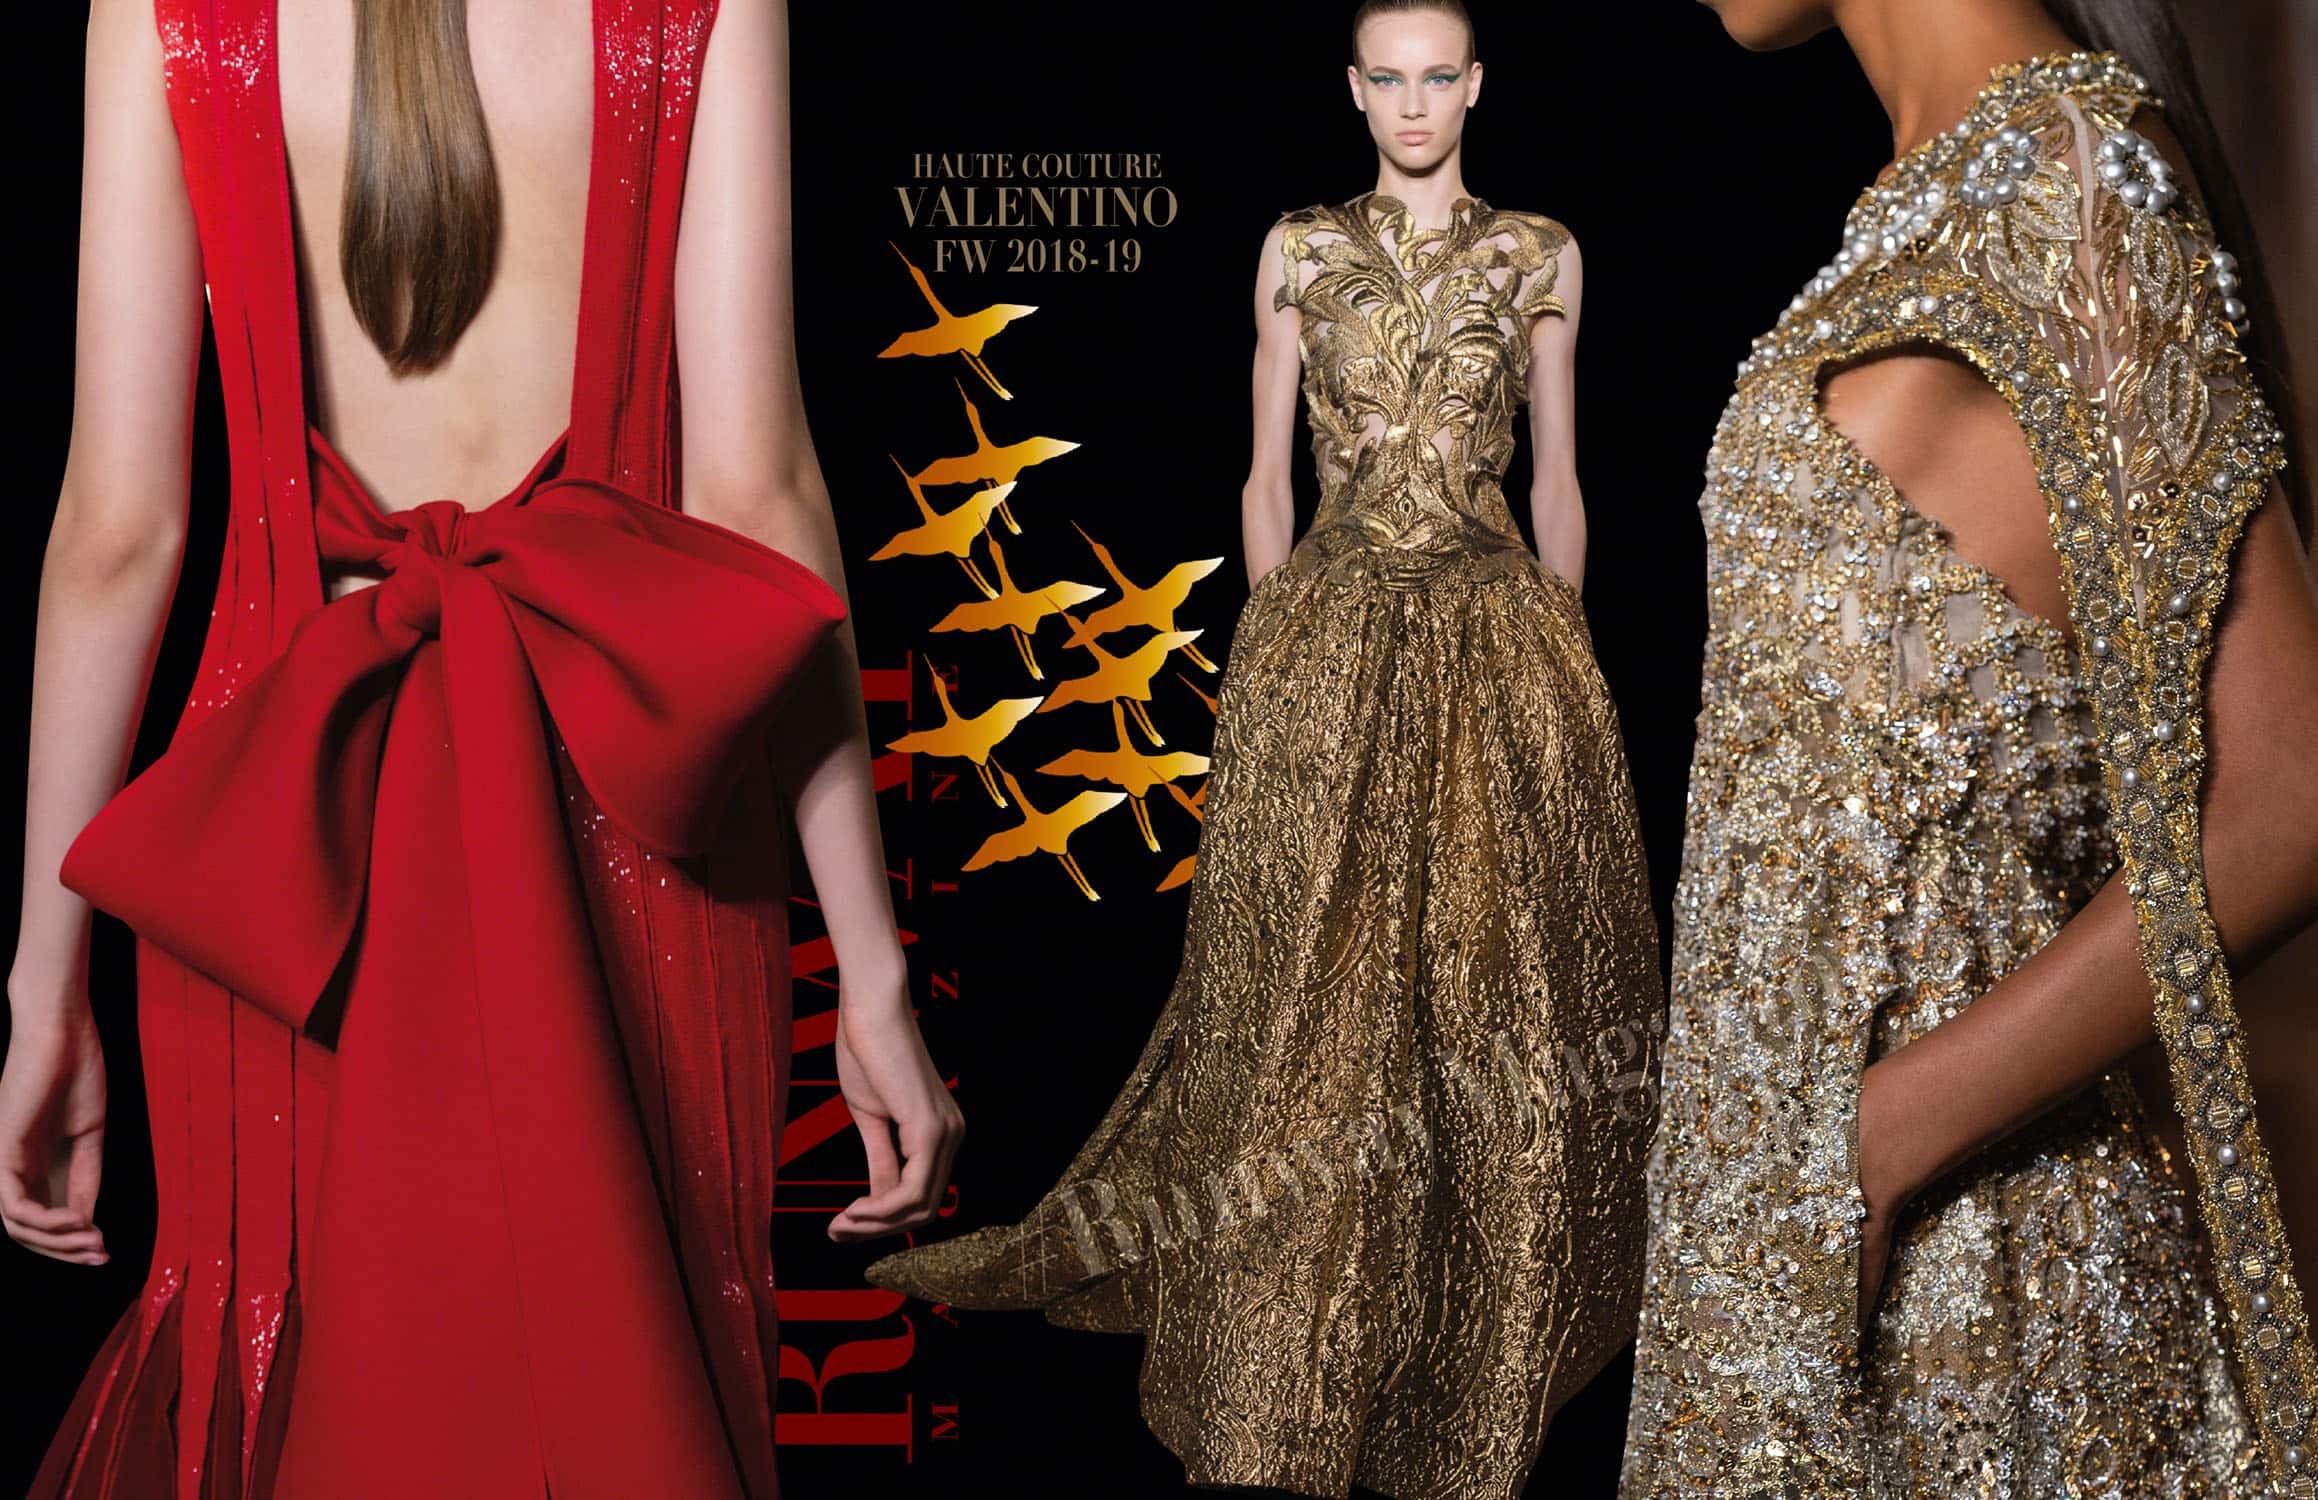 Valentino Haute Couture Fall-Winter 2018-19 Paris Fashion Week by RUNWAY MAGAZINE